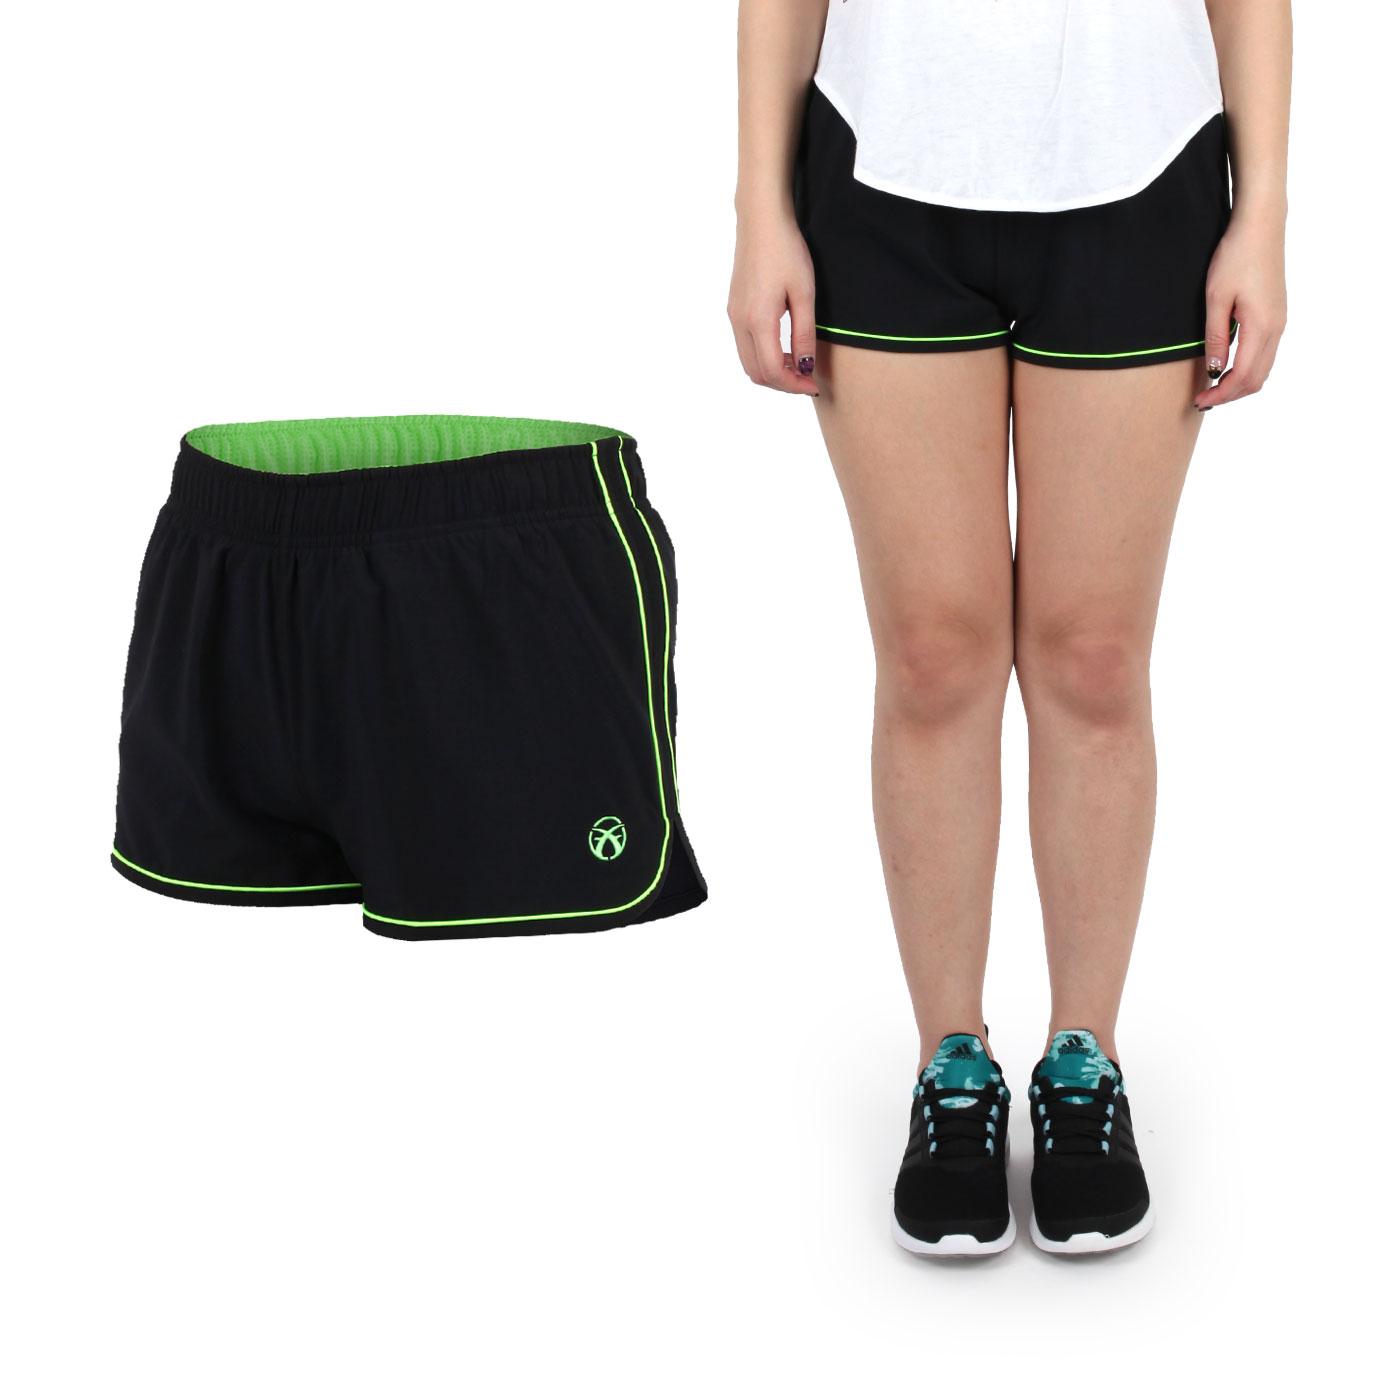 FIRESTAR 女款彈性平織慢跑短褲  CL625-10 - 黑螢光綠